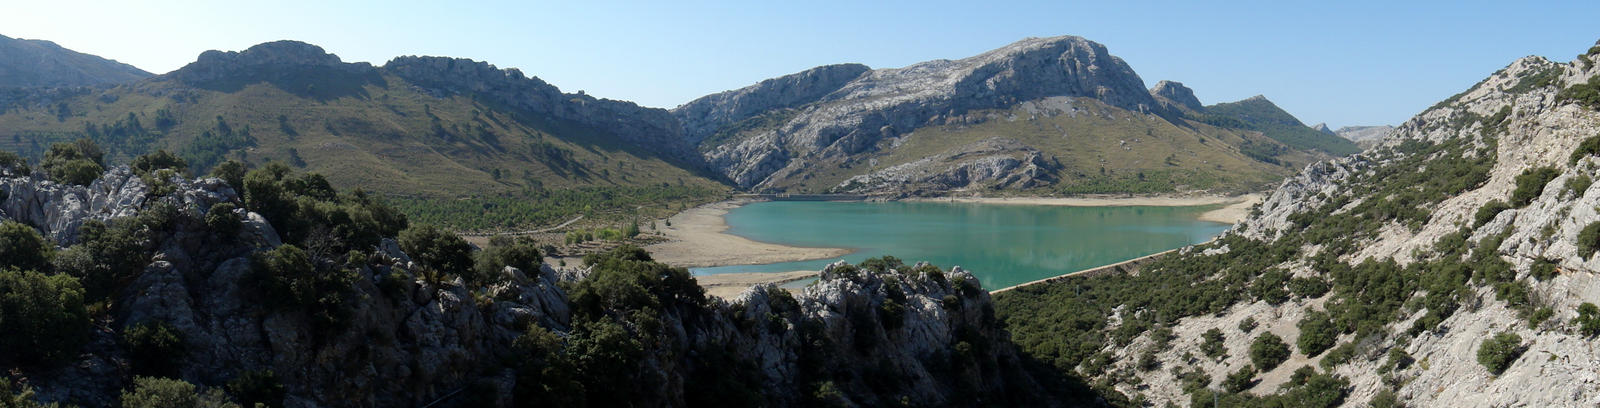 Cuber reservoir by AmBr0